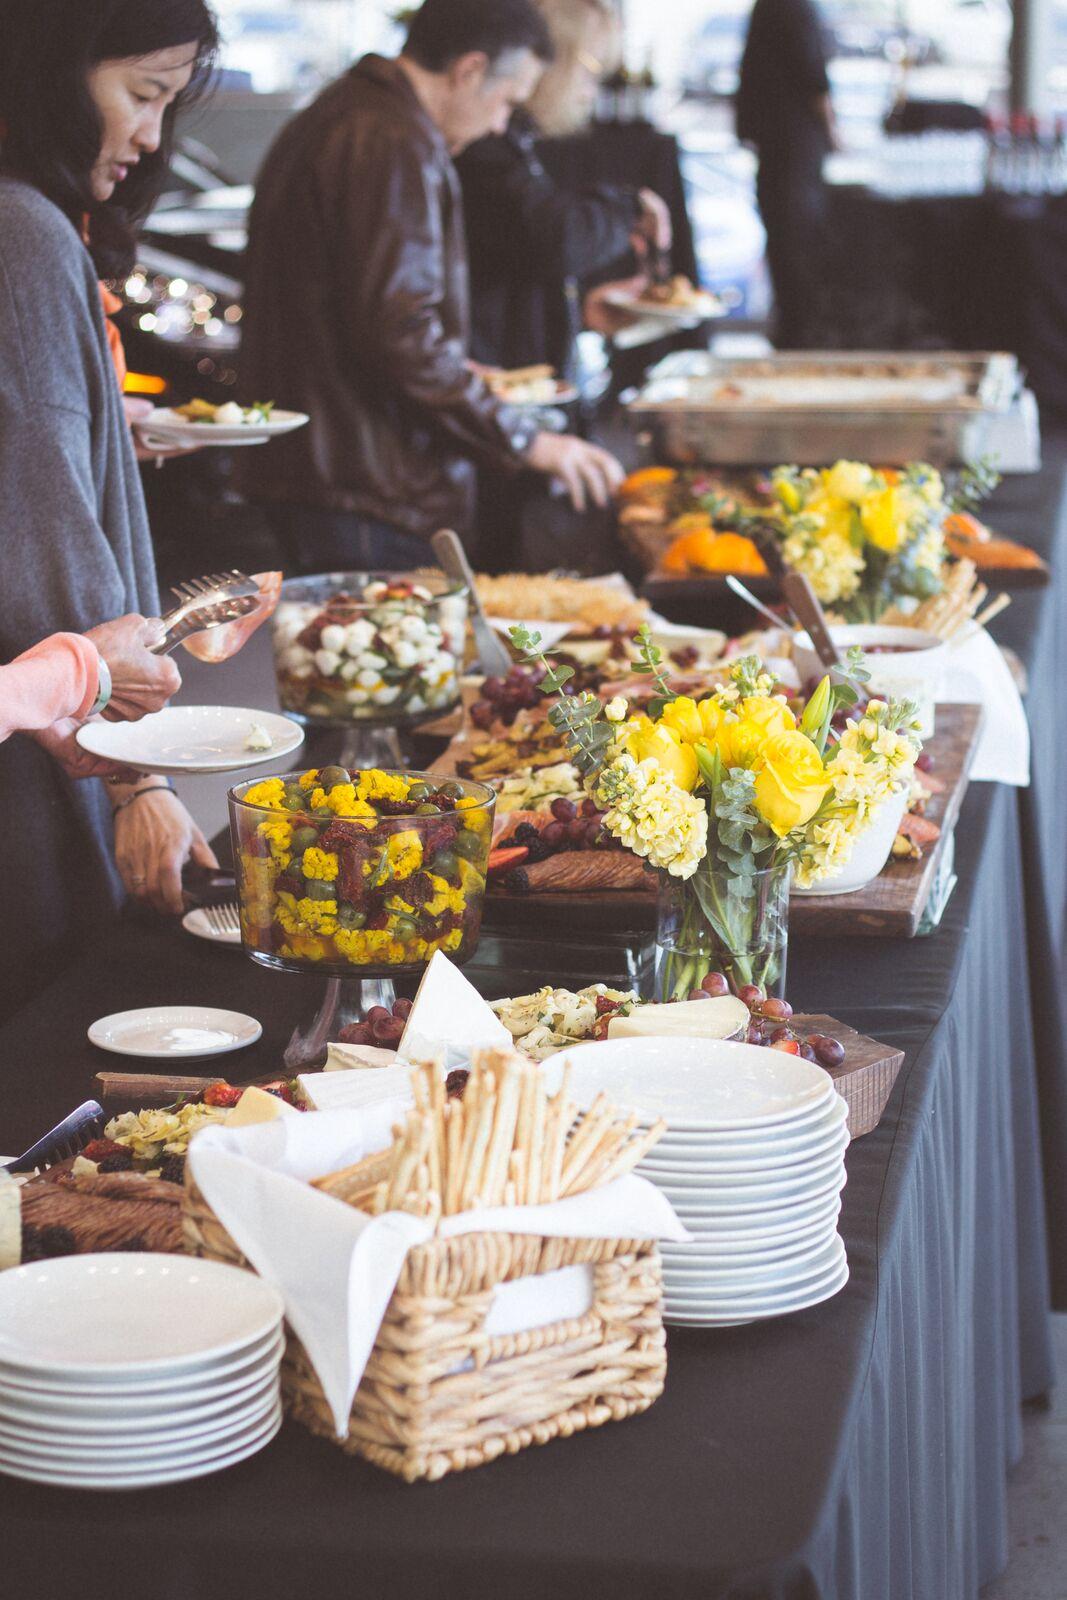 Pearl Catering Photo #2.jpg